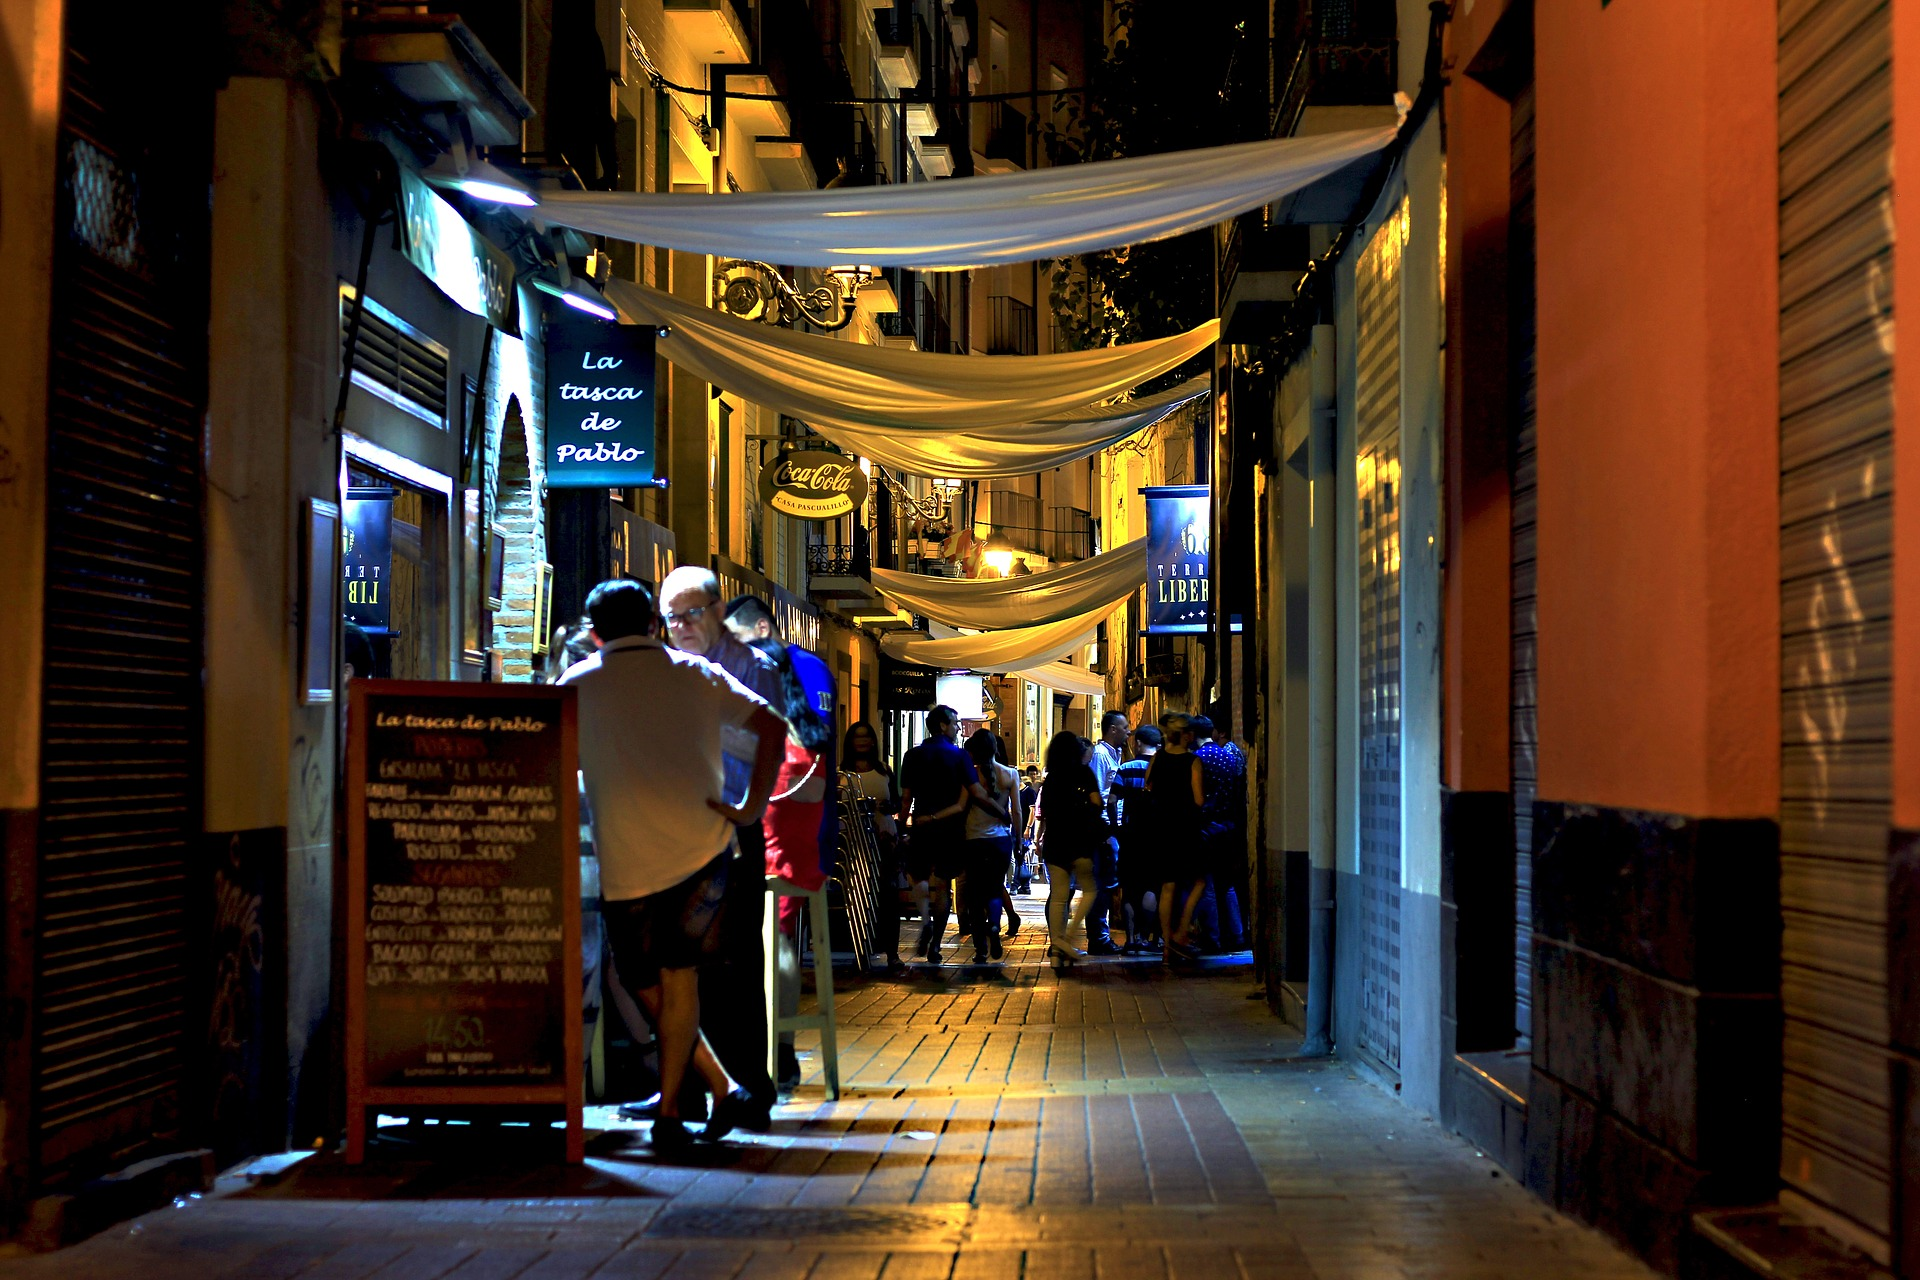 Noche en Zaragoza